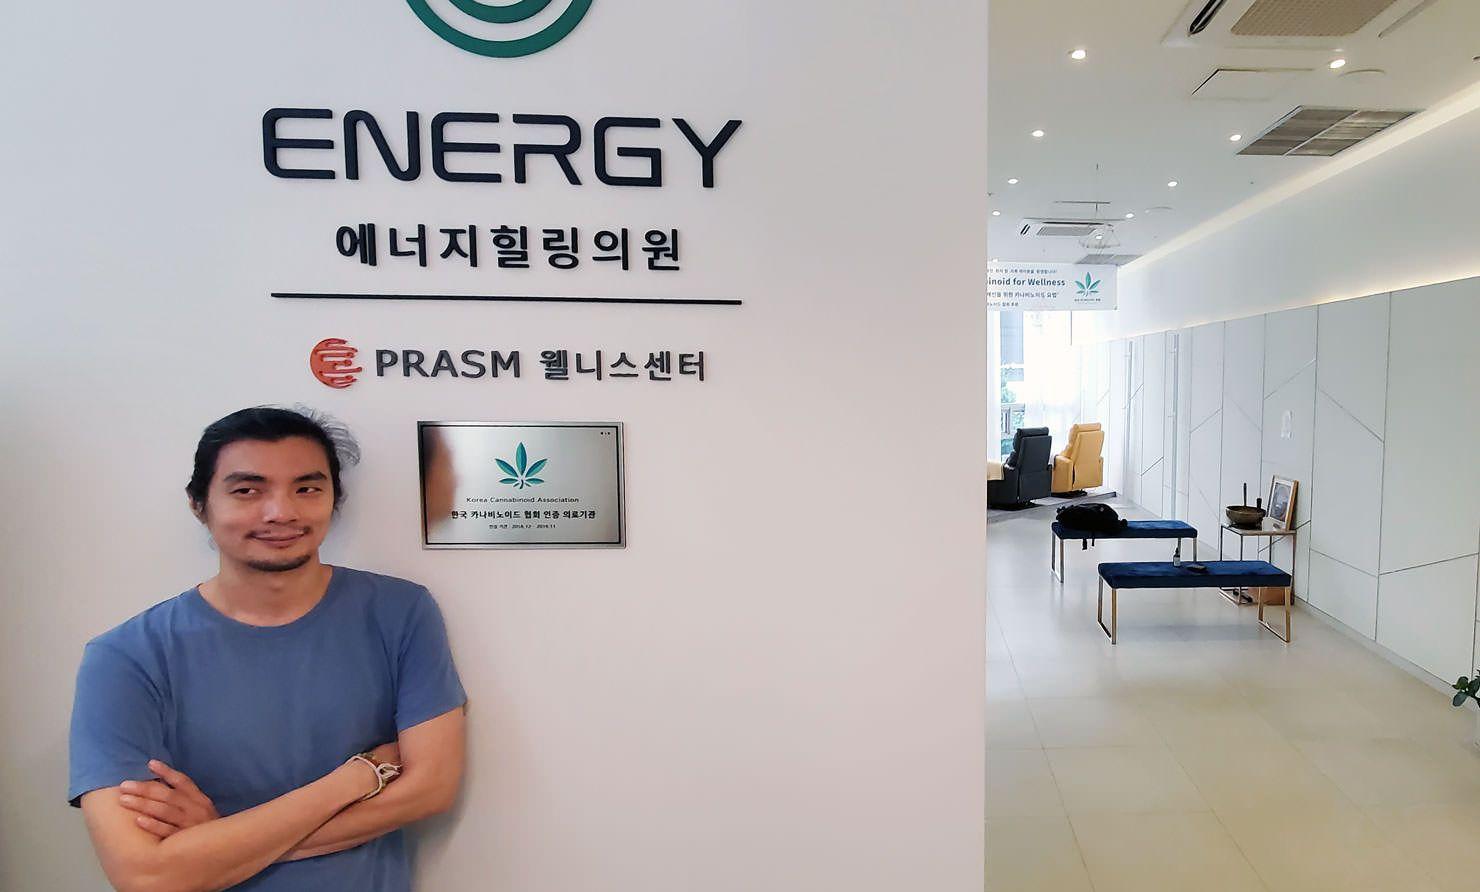 medical cannabis korea, South Korean medical cannabinoid imports surpass 300 units since law passed